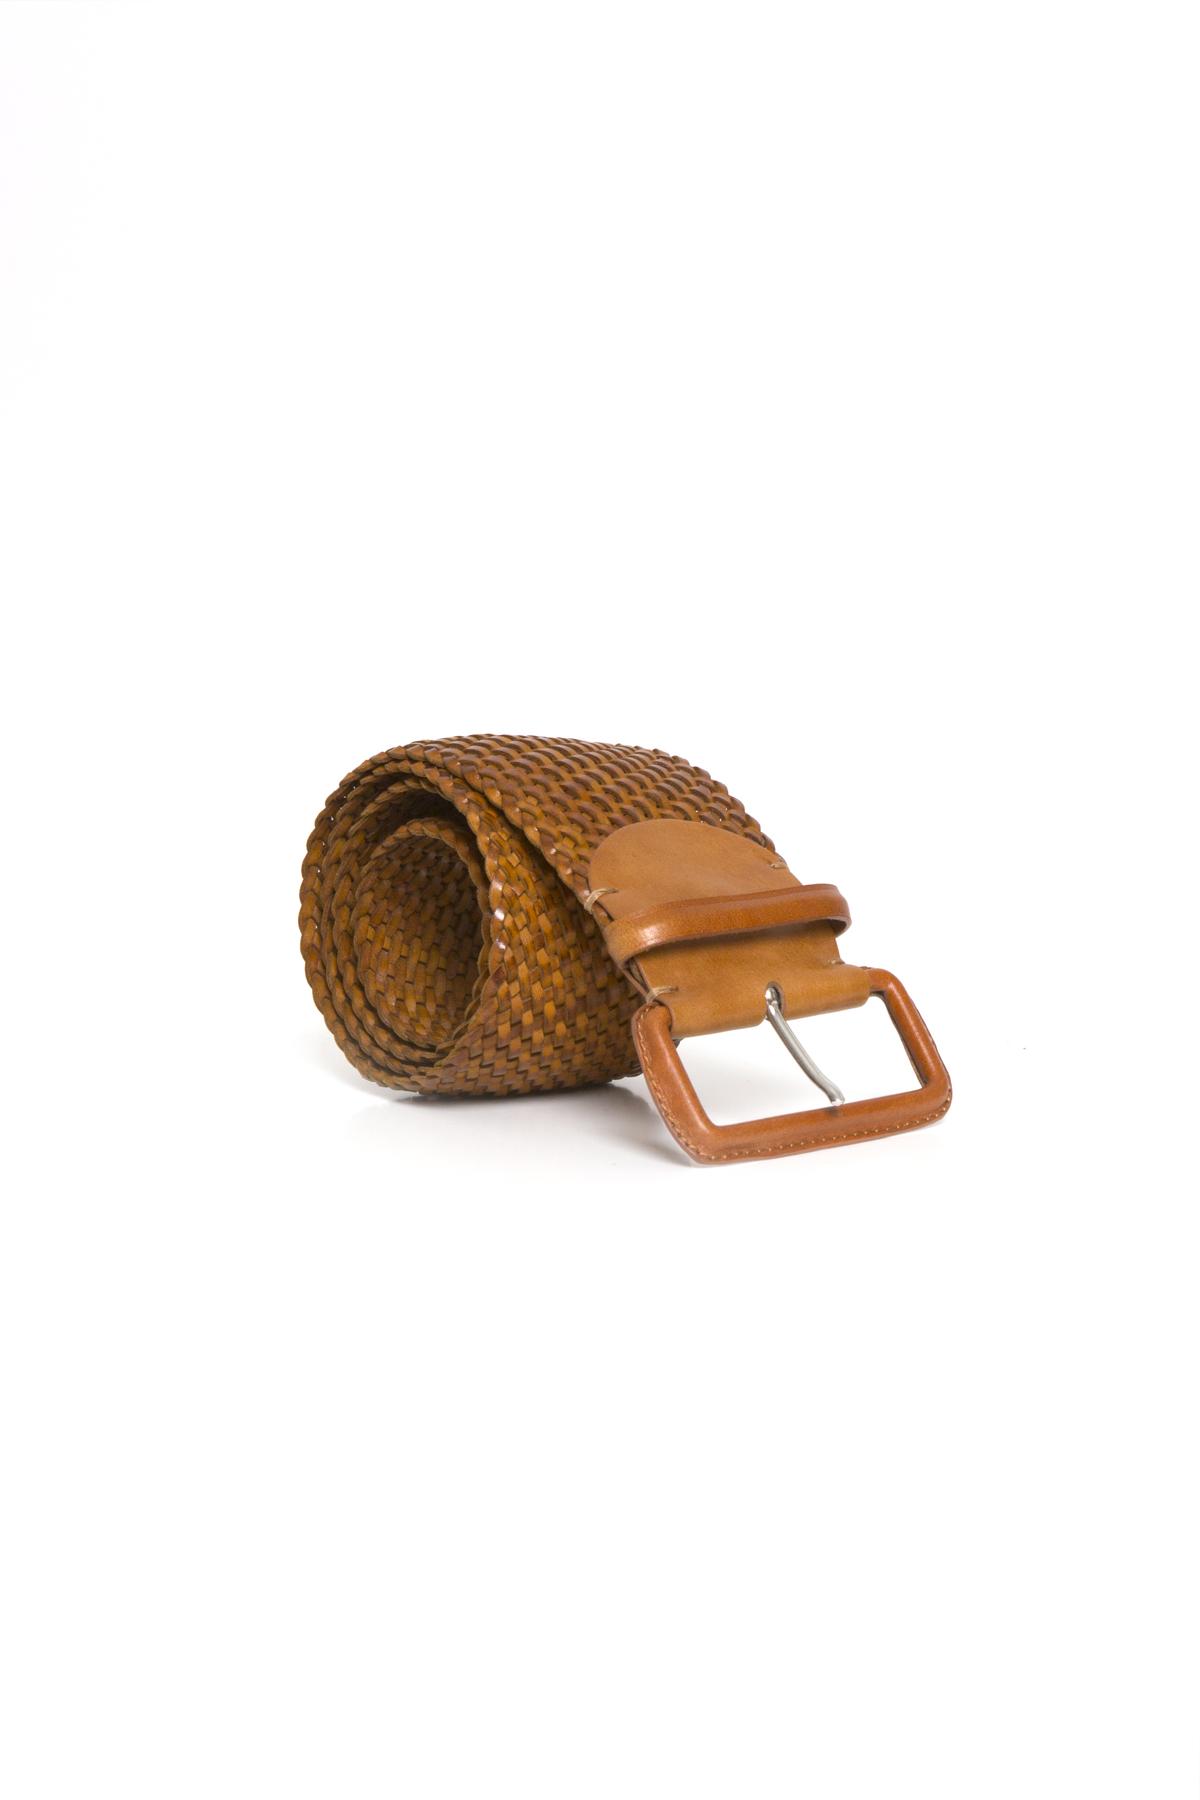 oia-belt-tabac-reptiles-house-leather-matcboxathens